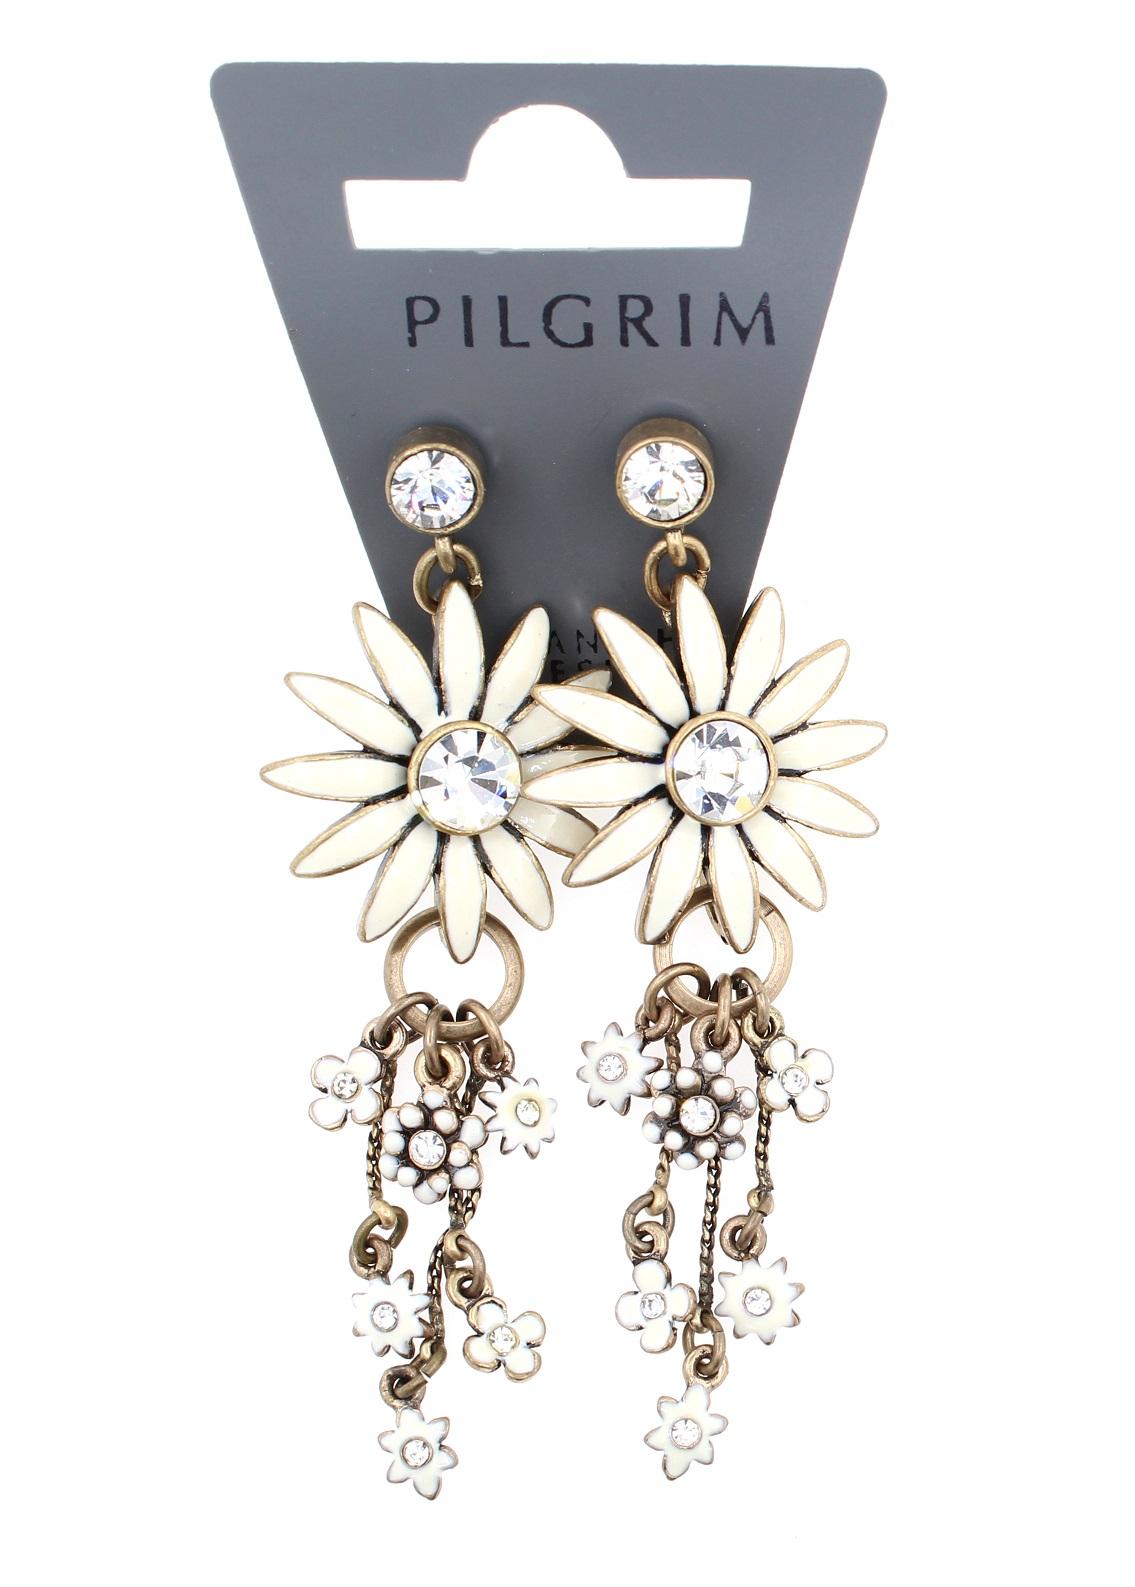 PILGRIM - Daisy - Elaborate Earrings - Oxidised Gold Plate/White BNWT